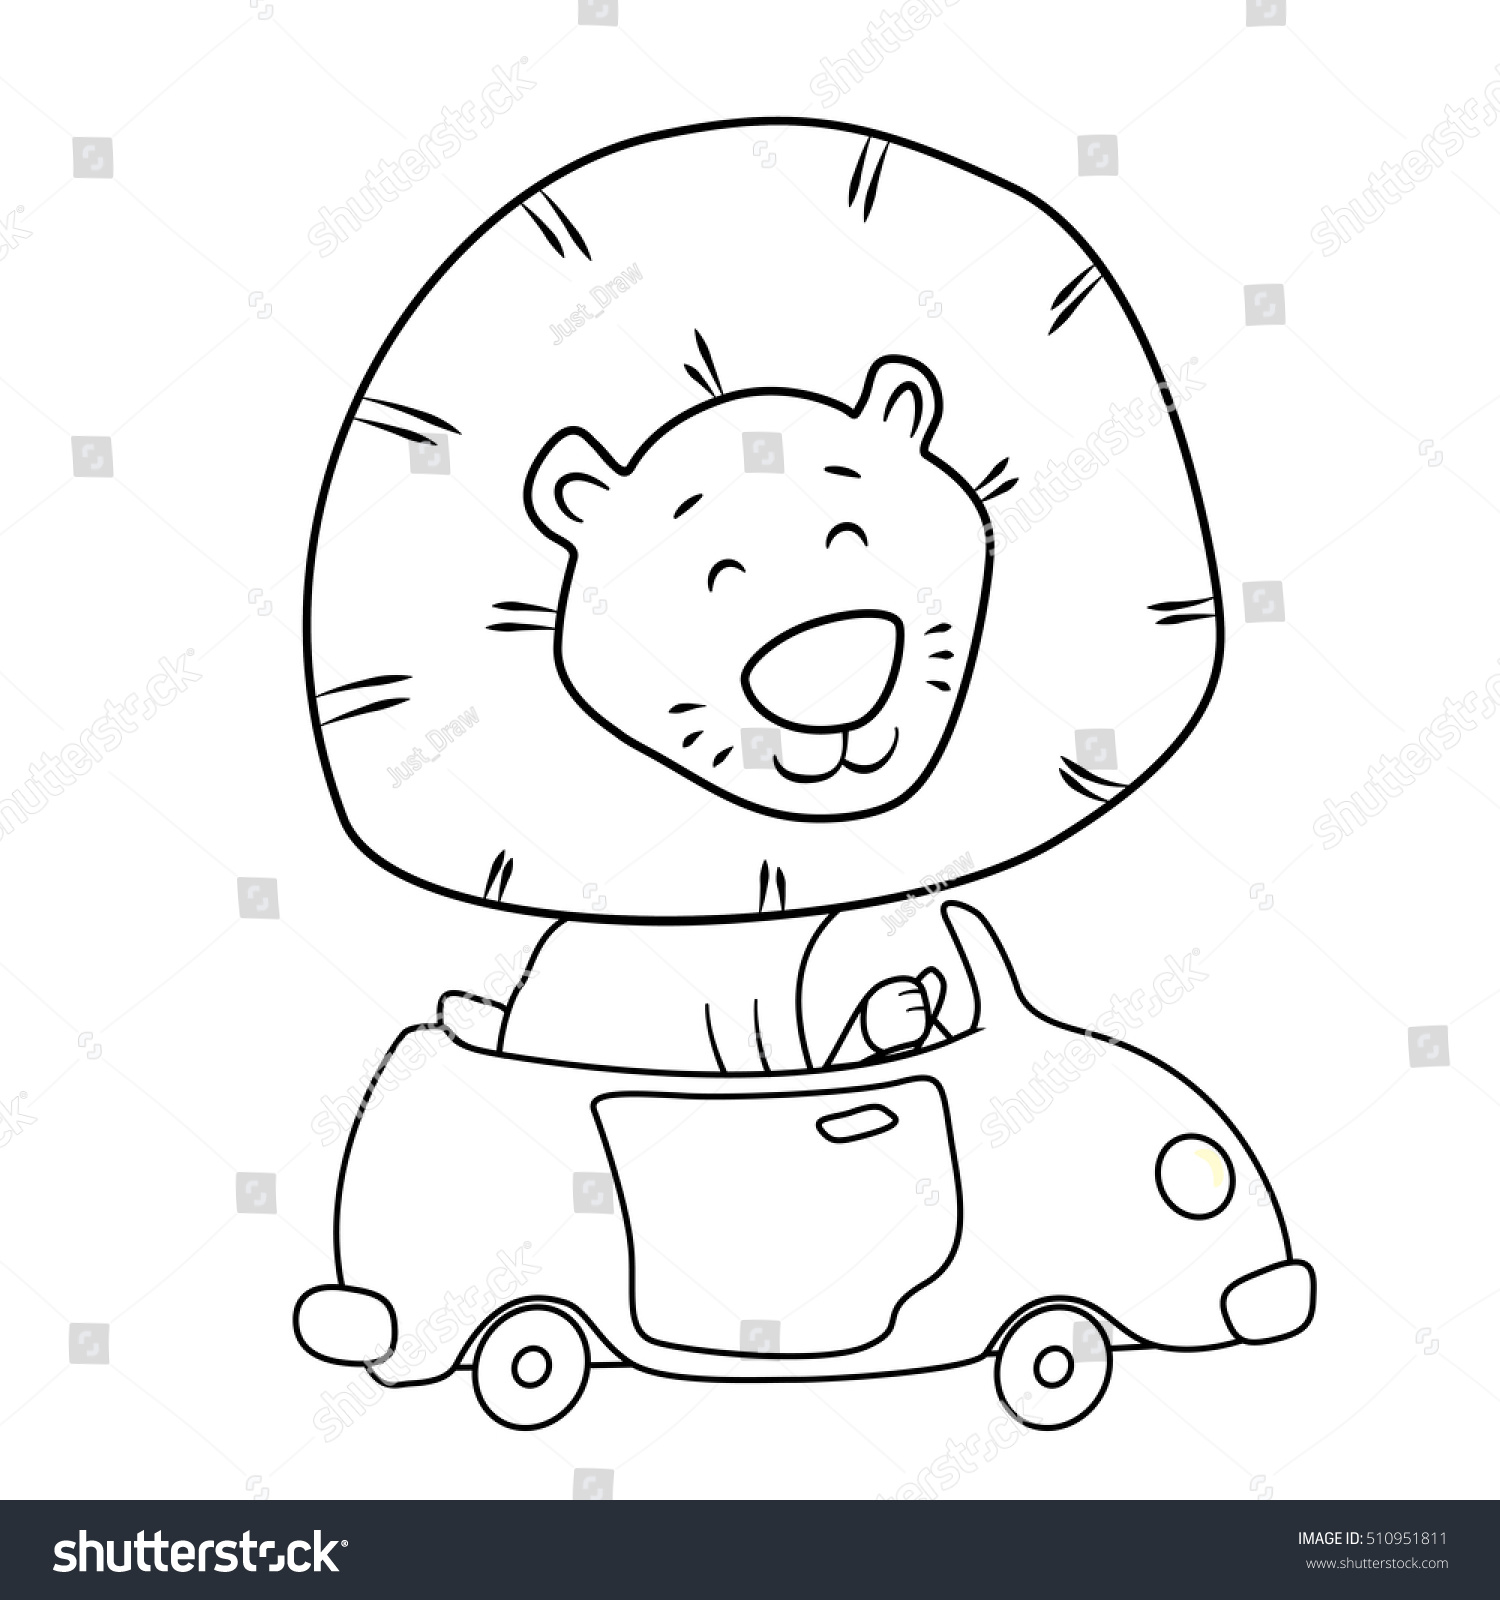 Cute Cartoon Lion Driving Car Coloring Stock Vector Royalty Free